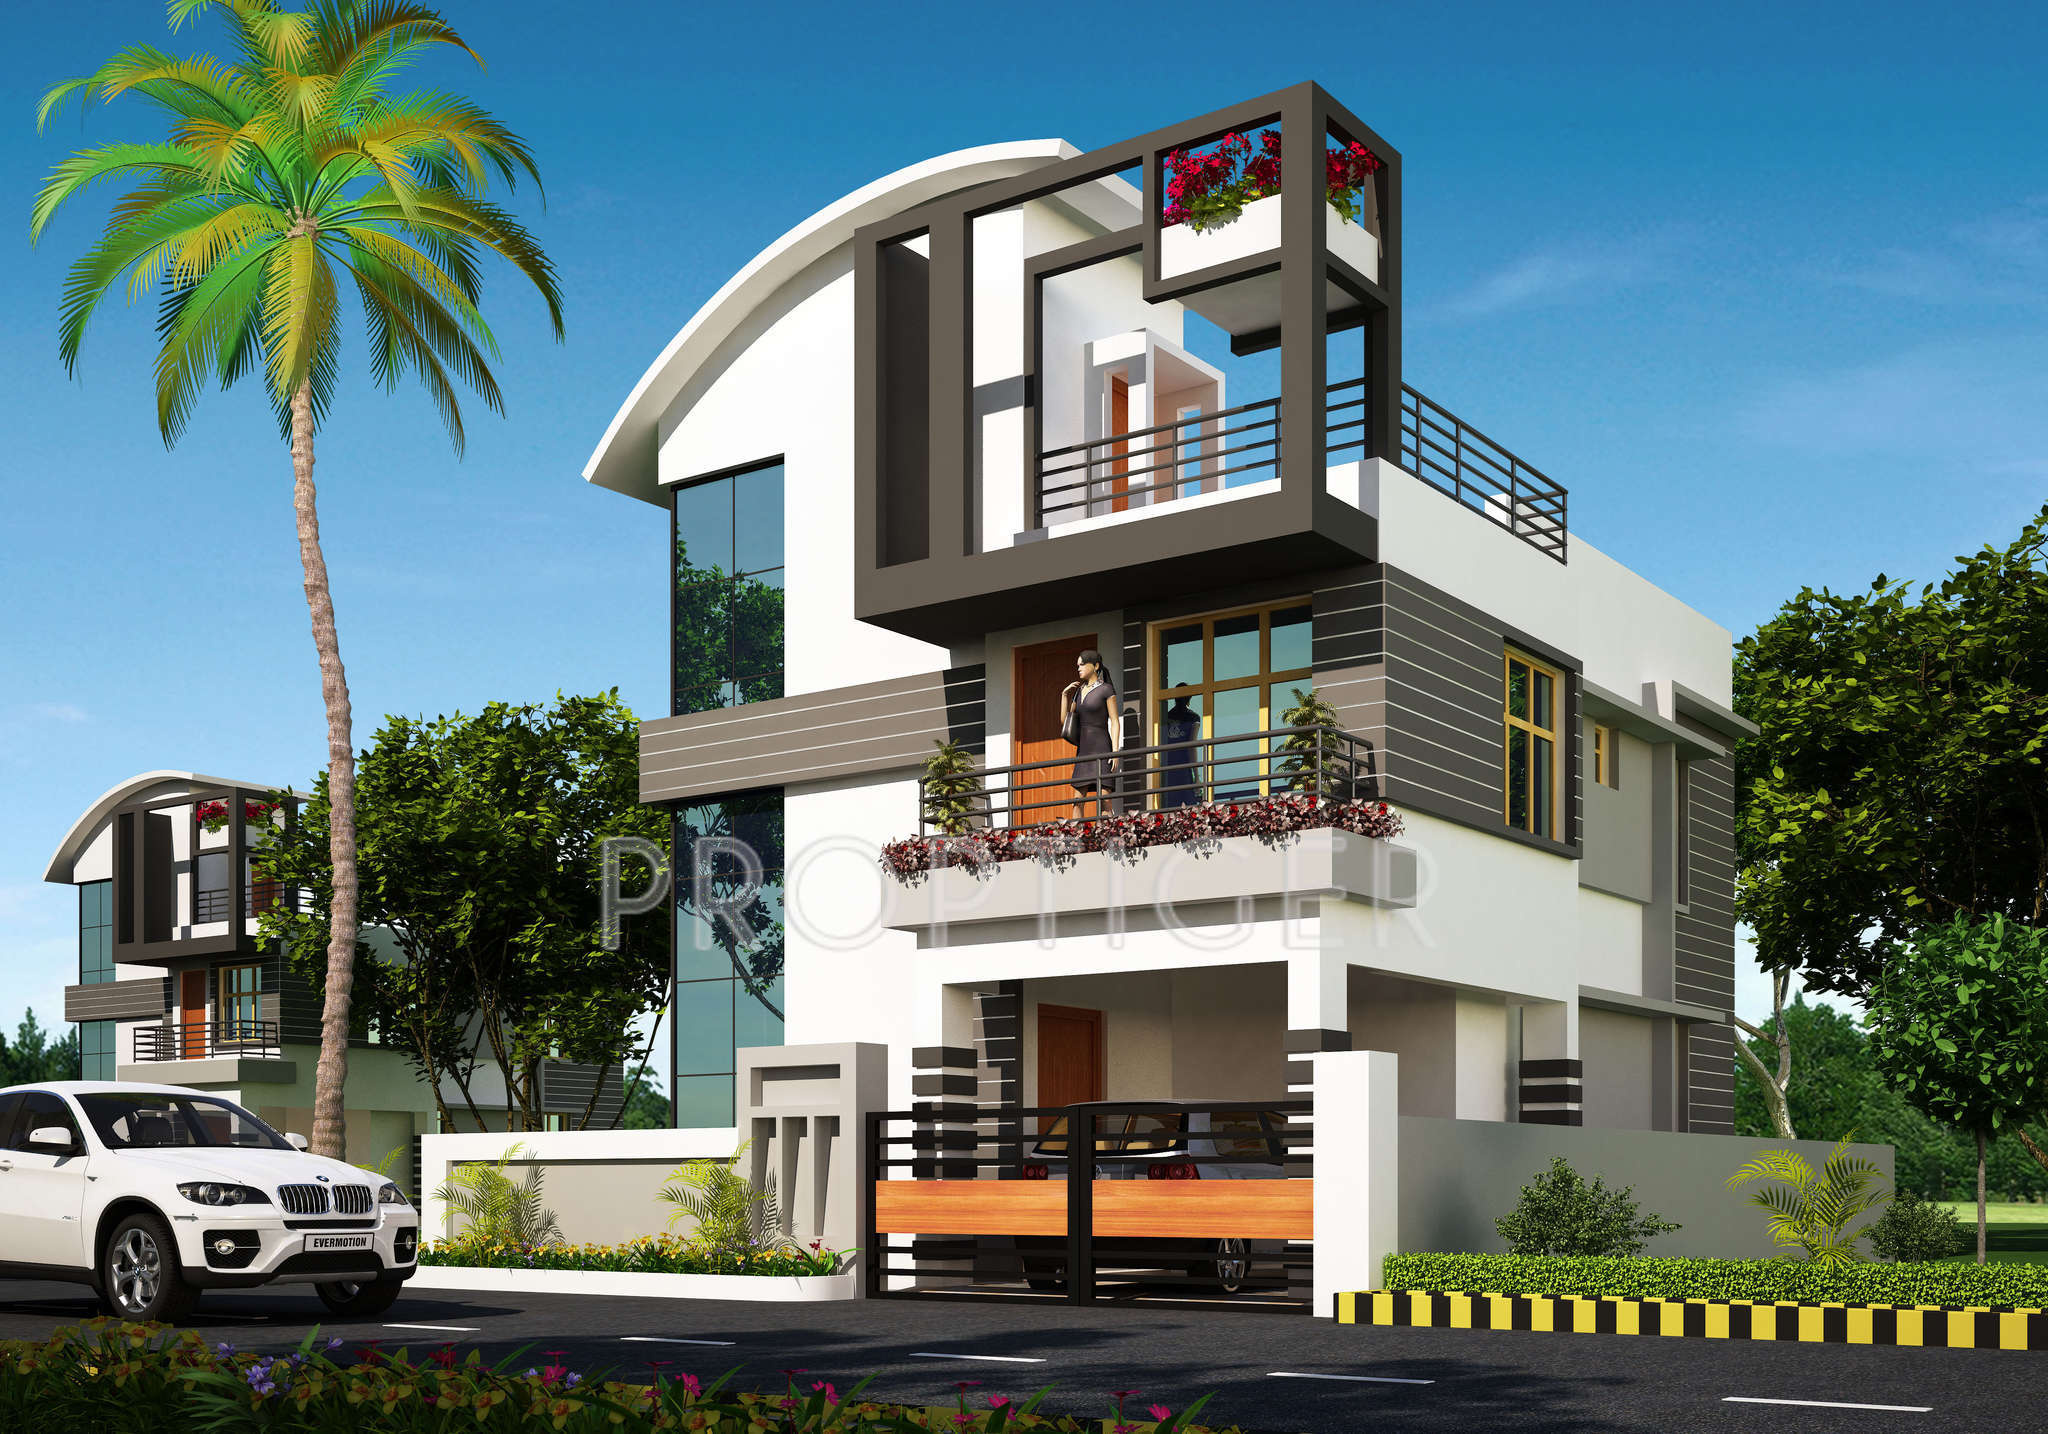 Building Elevation Designs In Pune | Joy Studio Design